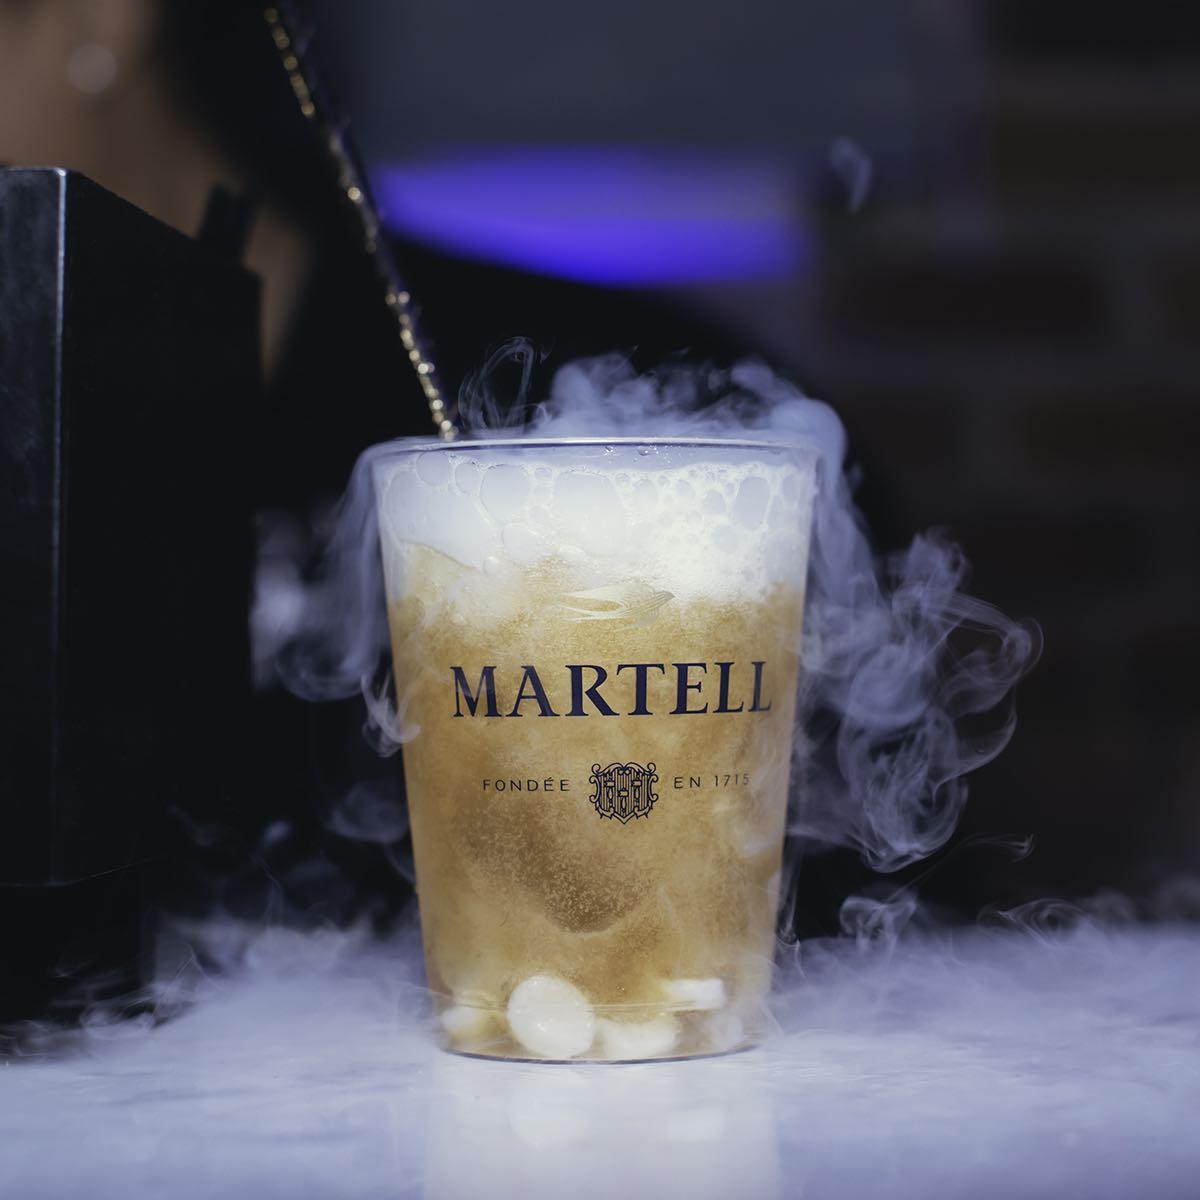 FY19_MAR_BLUESWIFT_NATIONAL_COCKTAIL_INSTAGRAM_STILL_1x1_Smoking-Cocktail-7886.jpeg